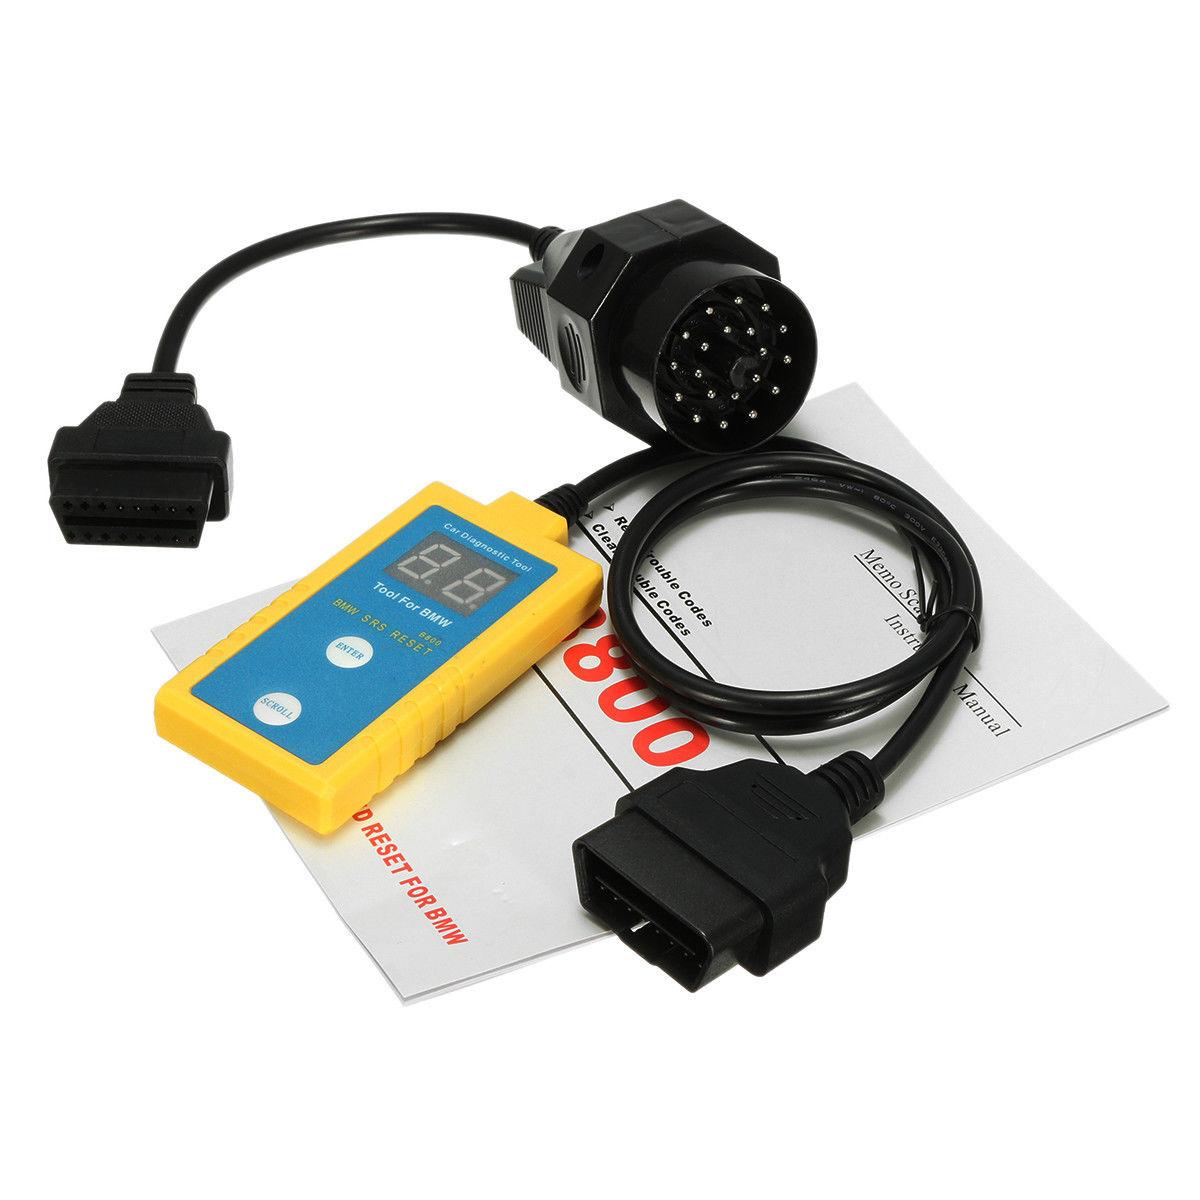 Details about Car Airbag Diagnostic Scanner Reset SRS Codes Reader 20Pin  Set For BMW E36 E46